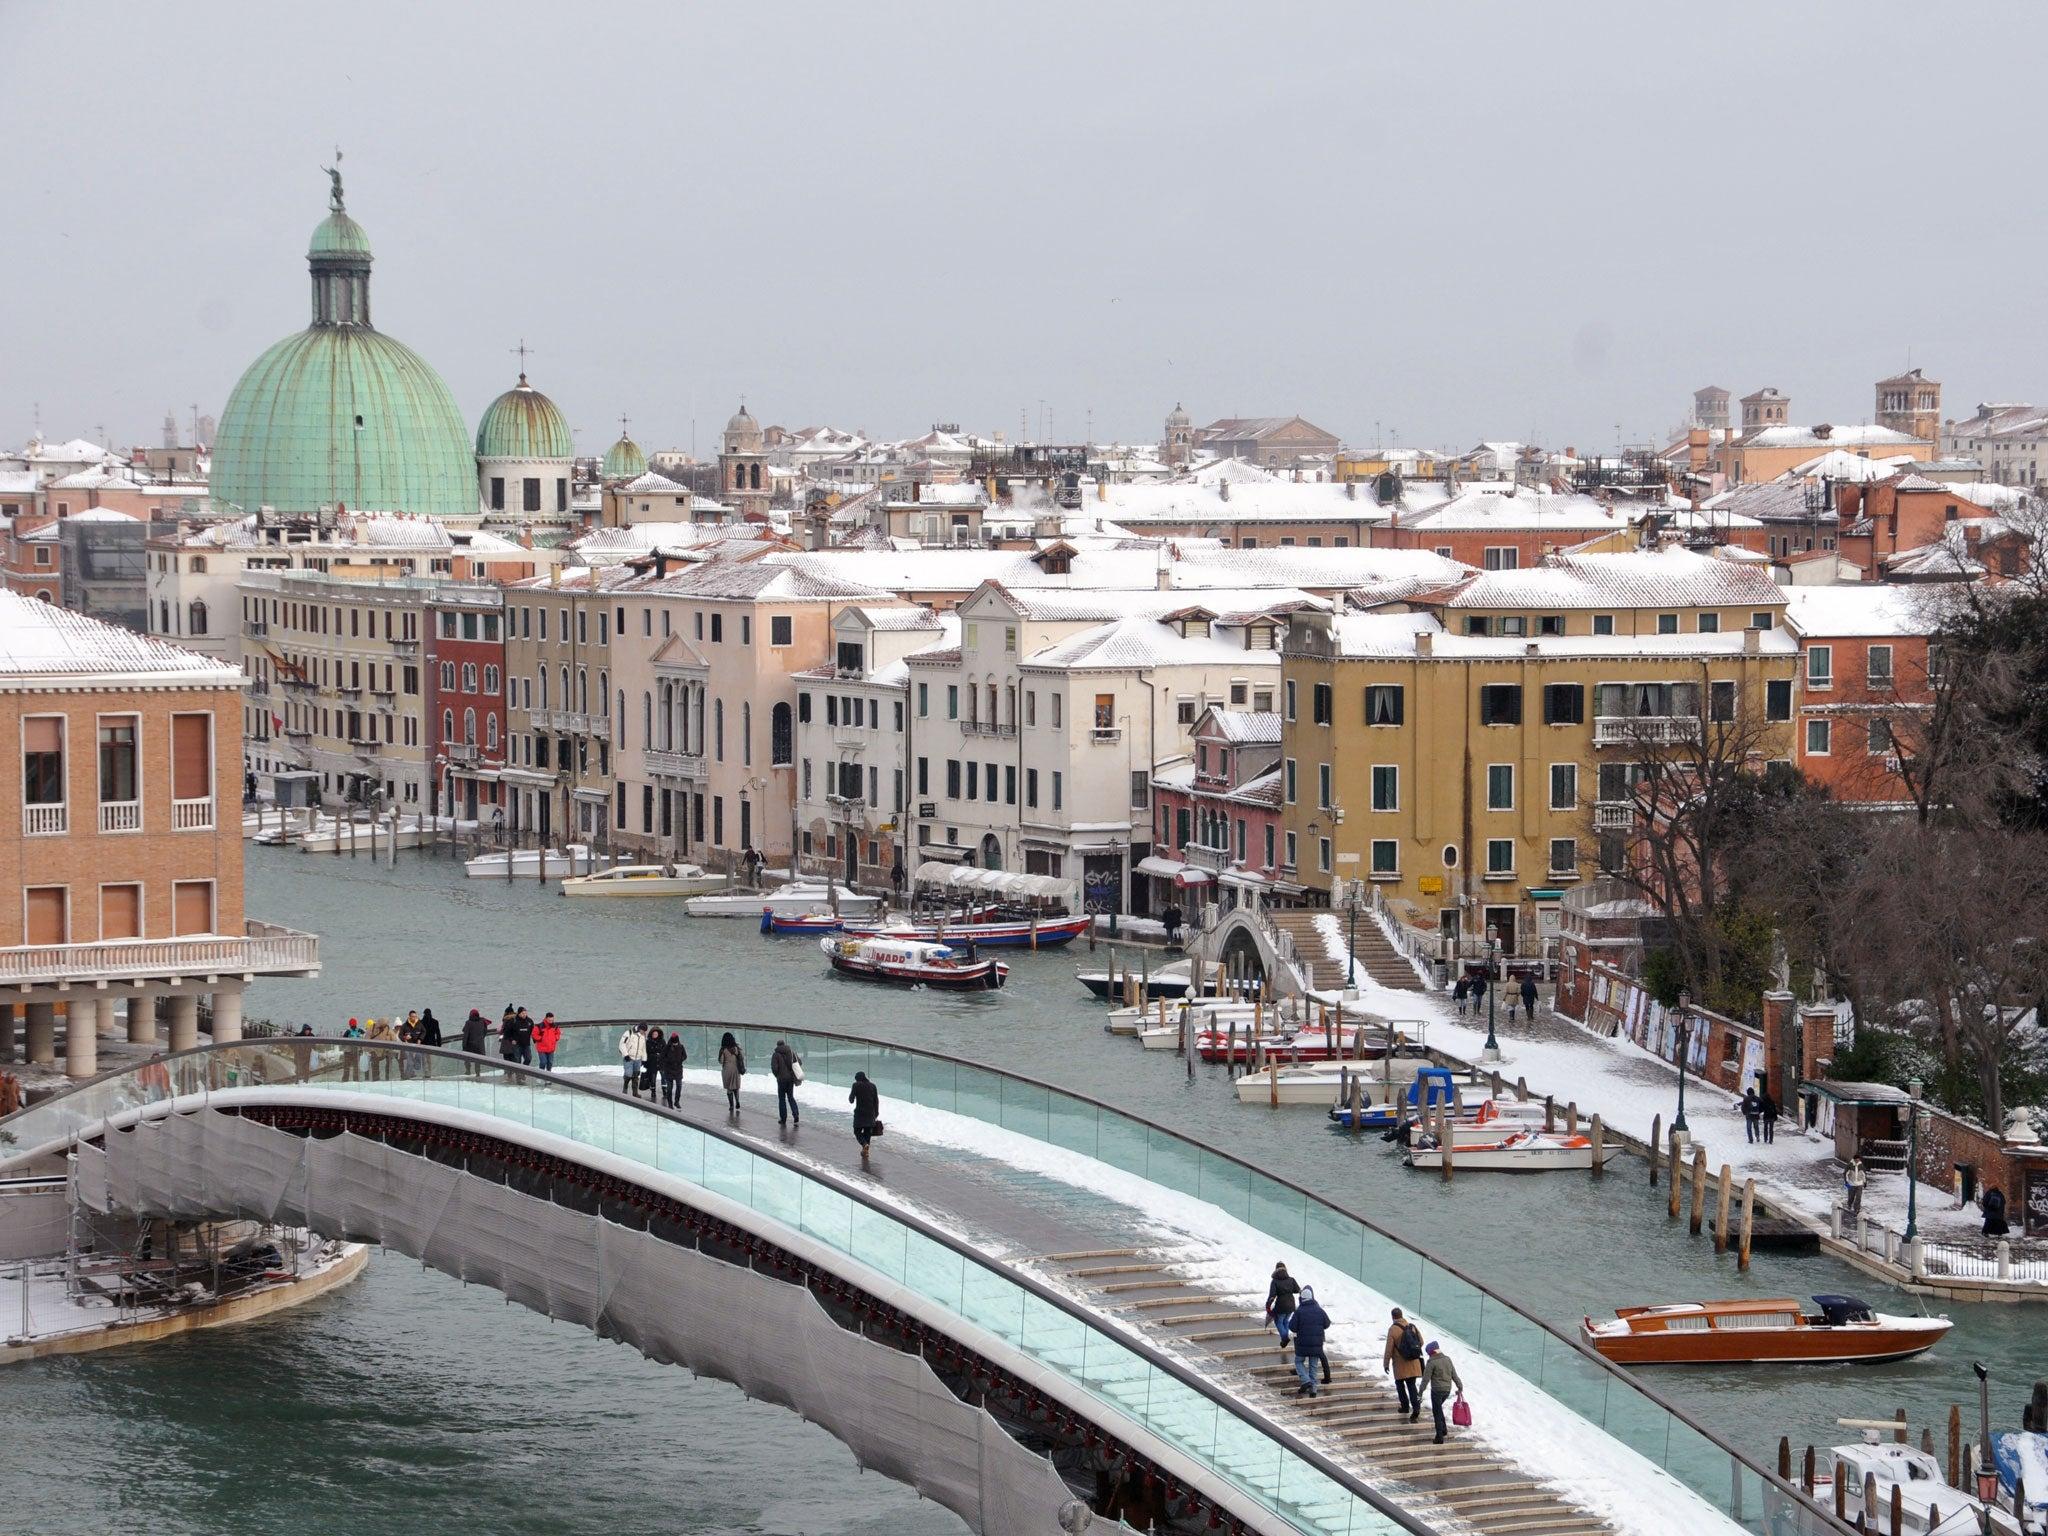 calatrava bridge venice photos - photo#2